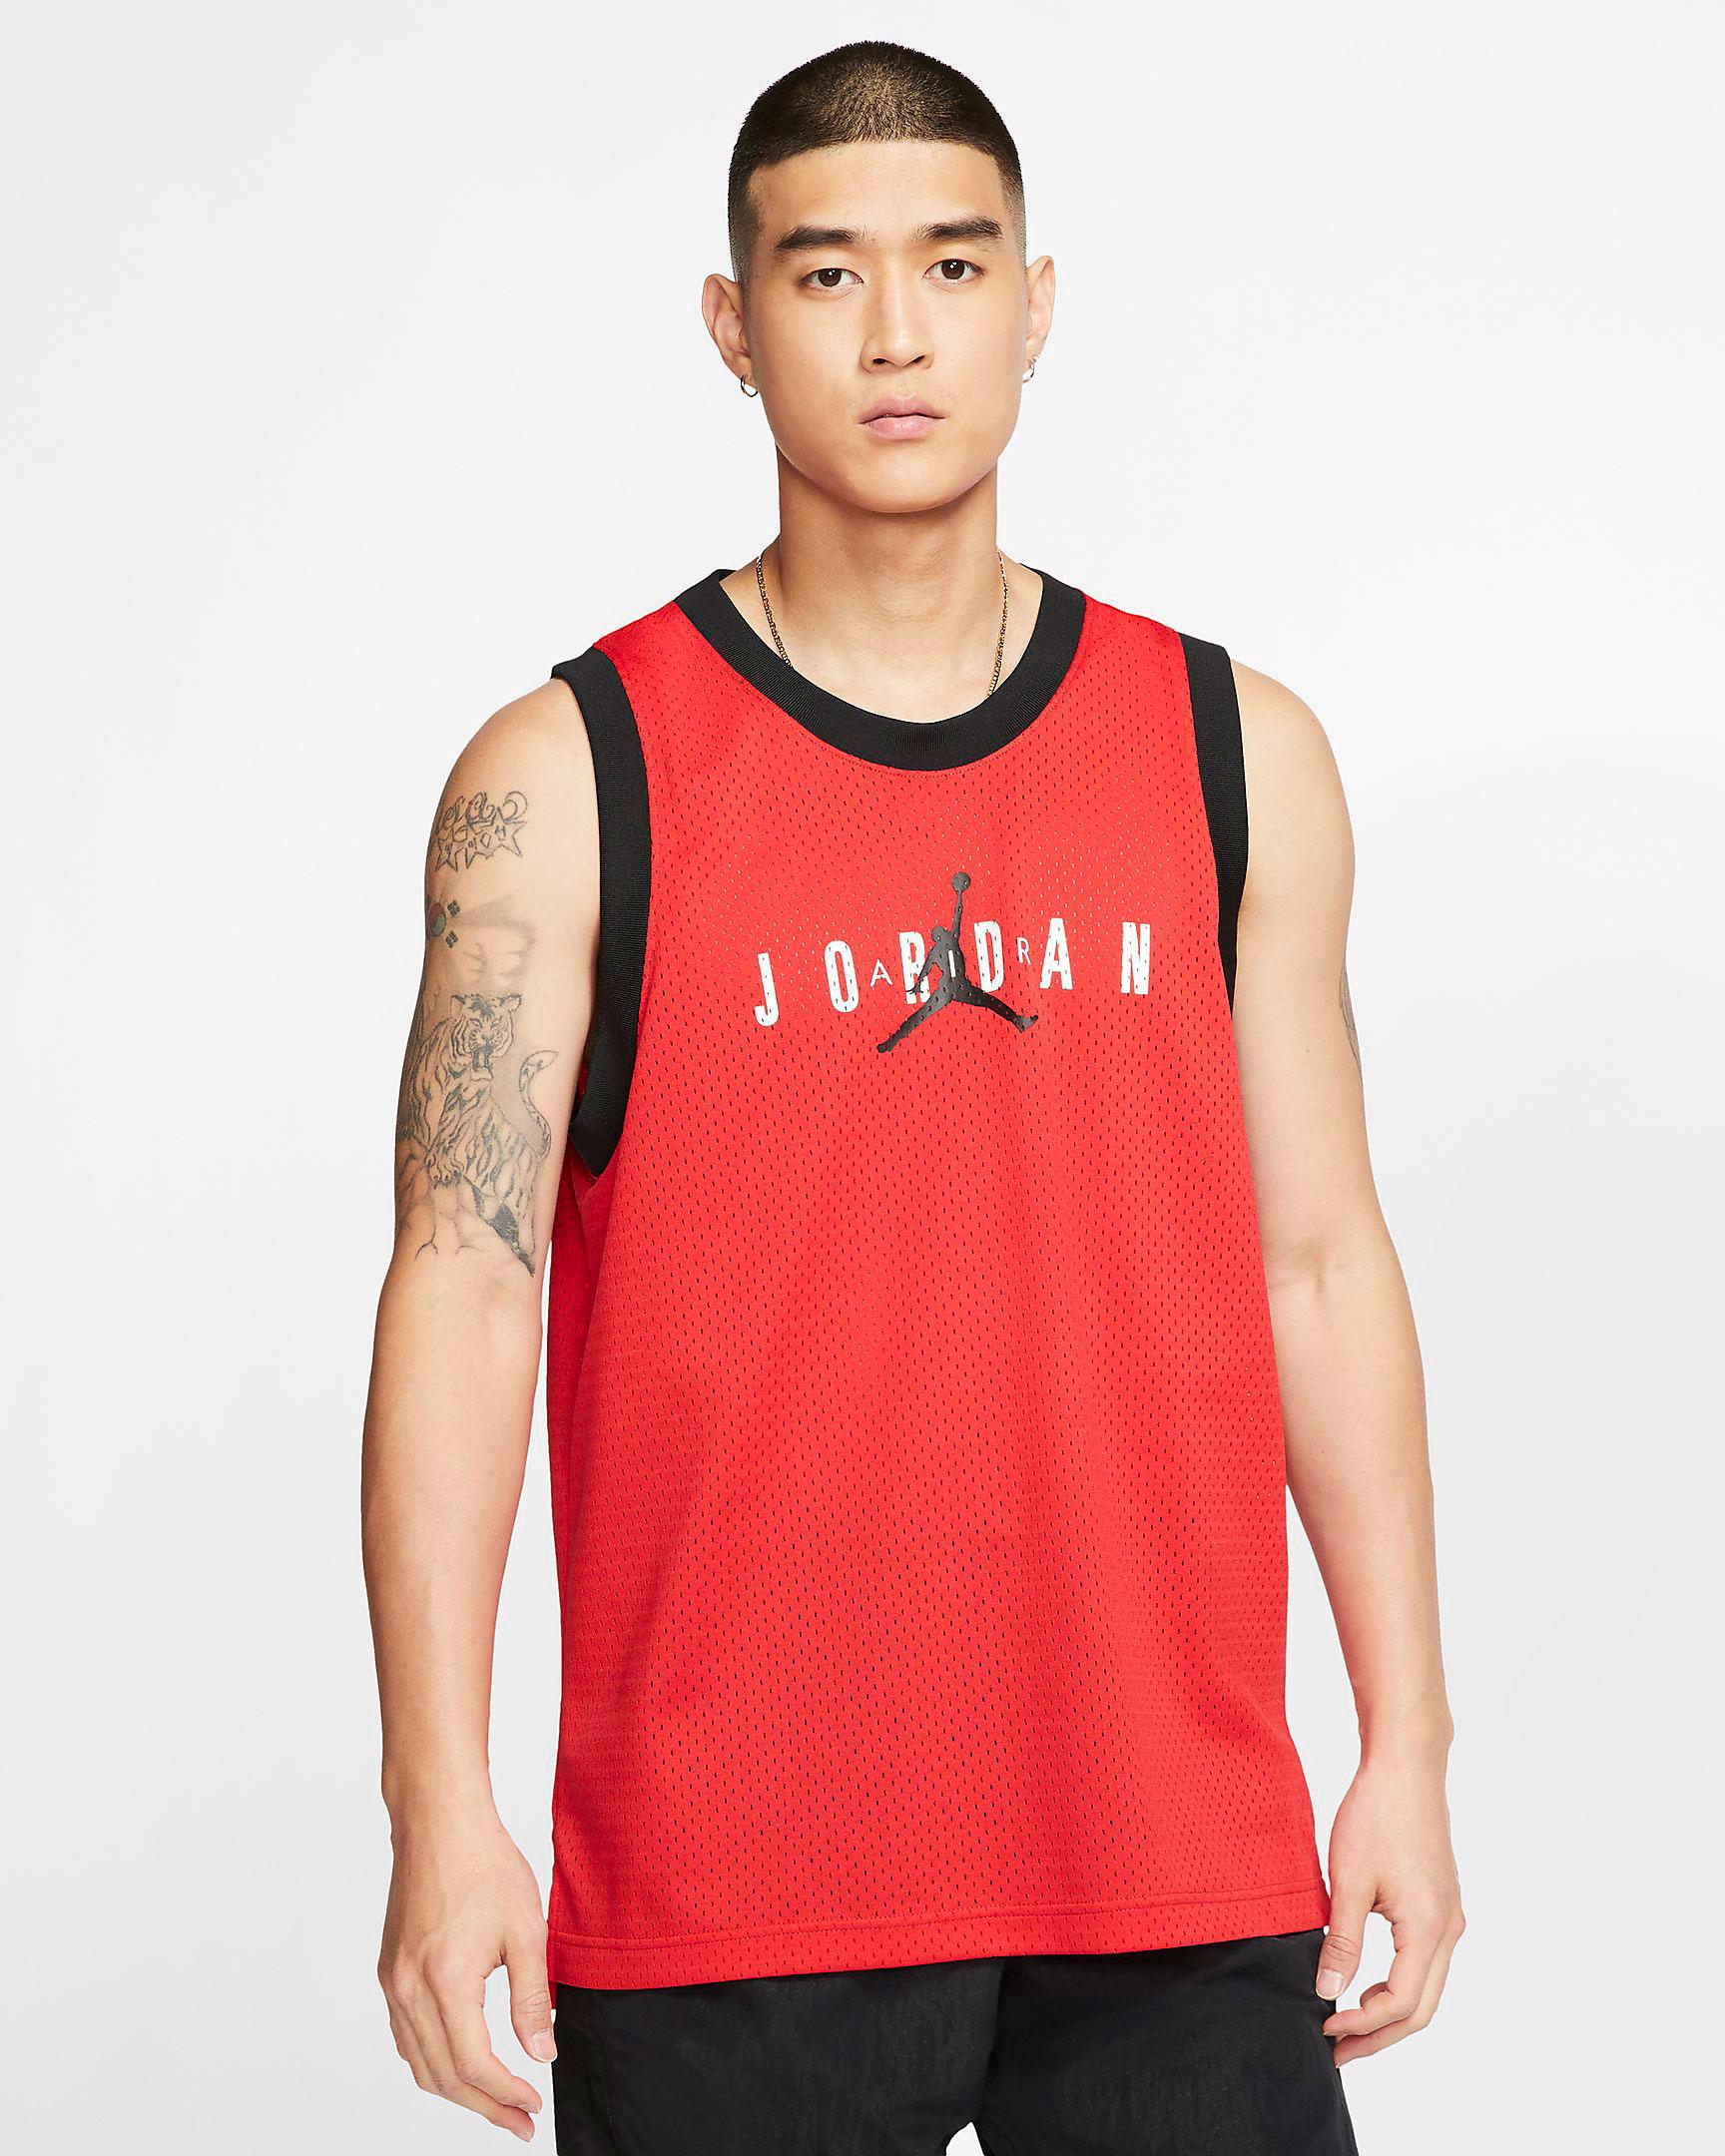 jordan-sport-dna-jersey-red-black